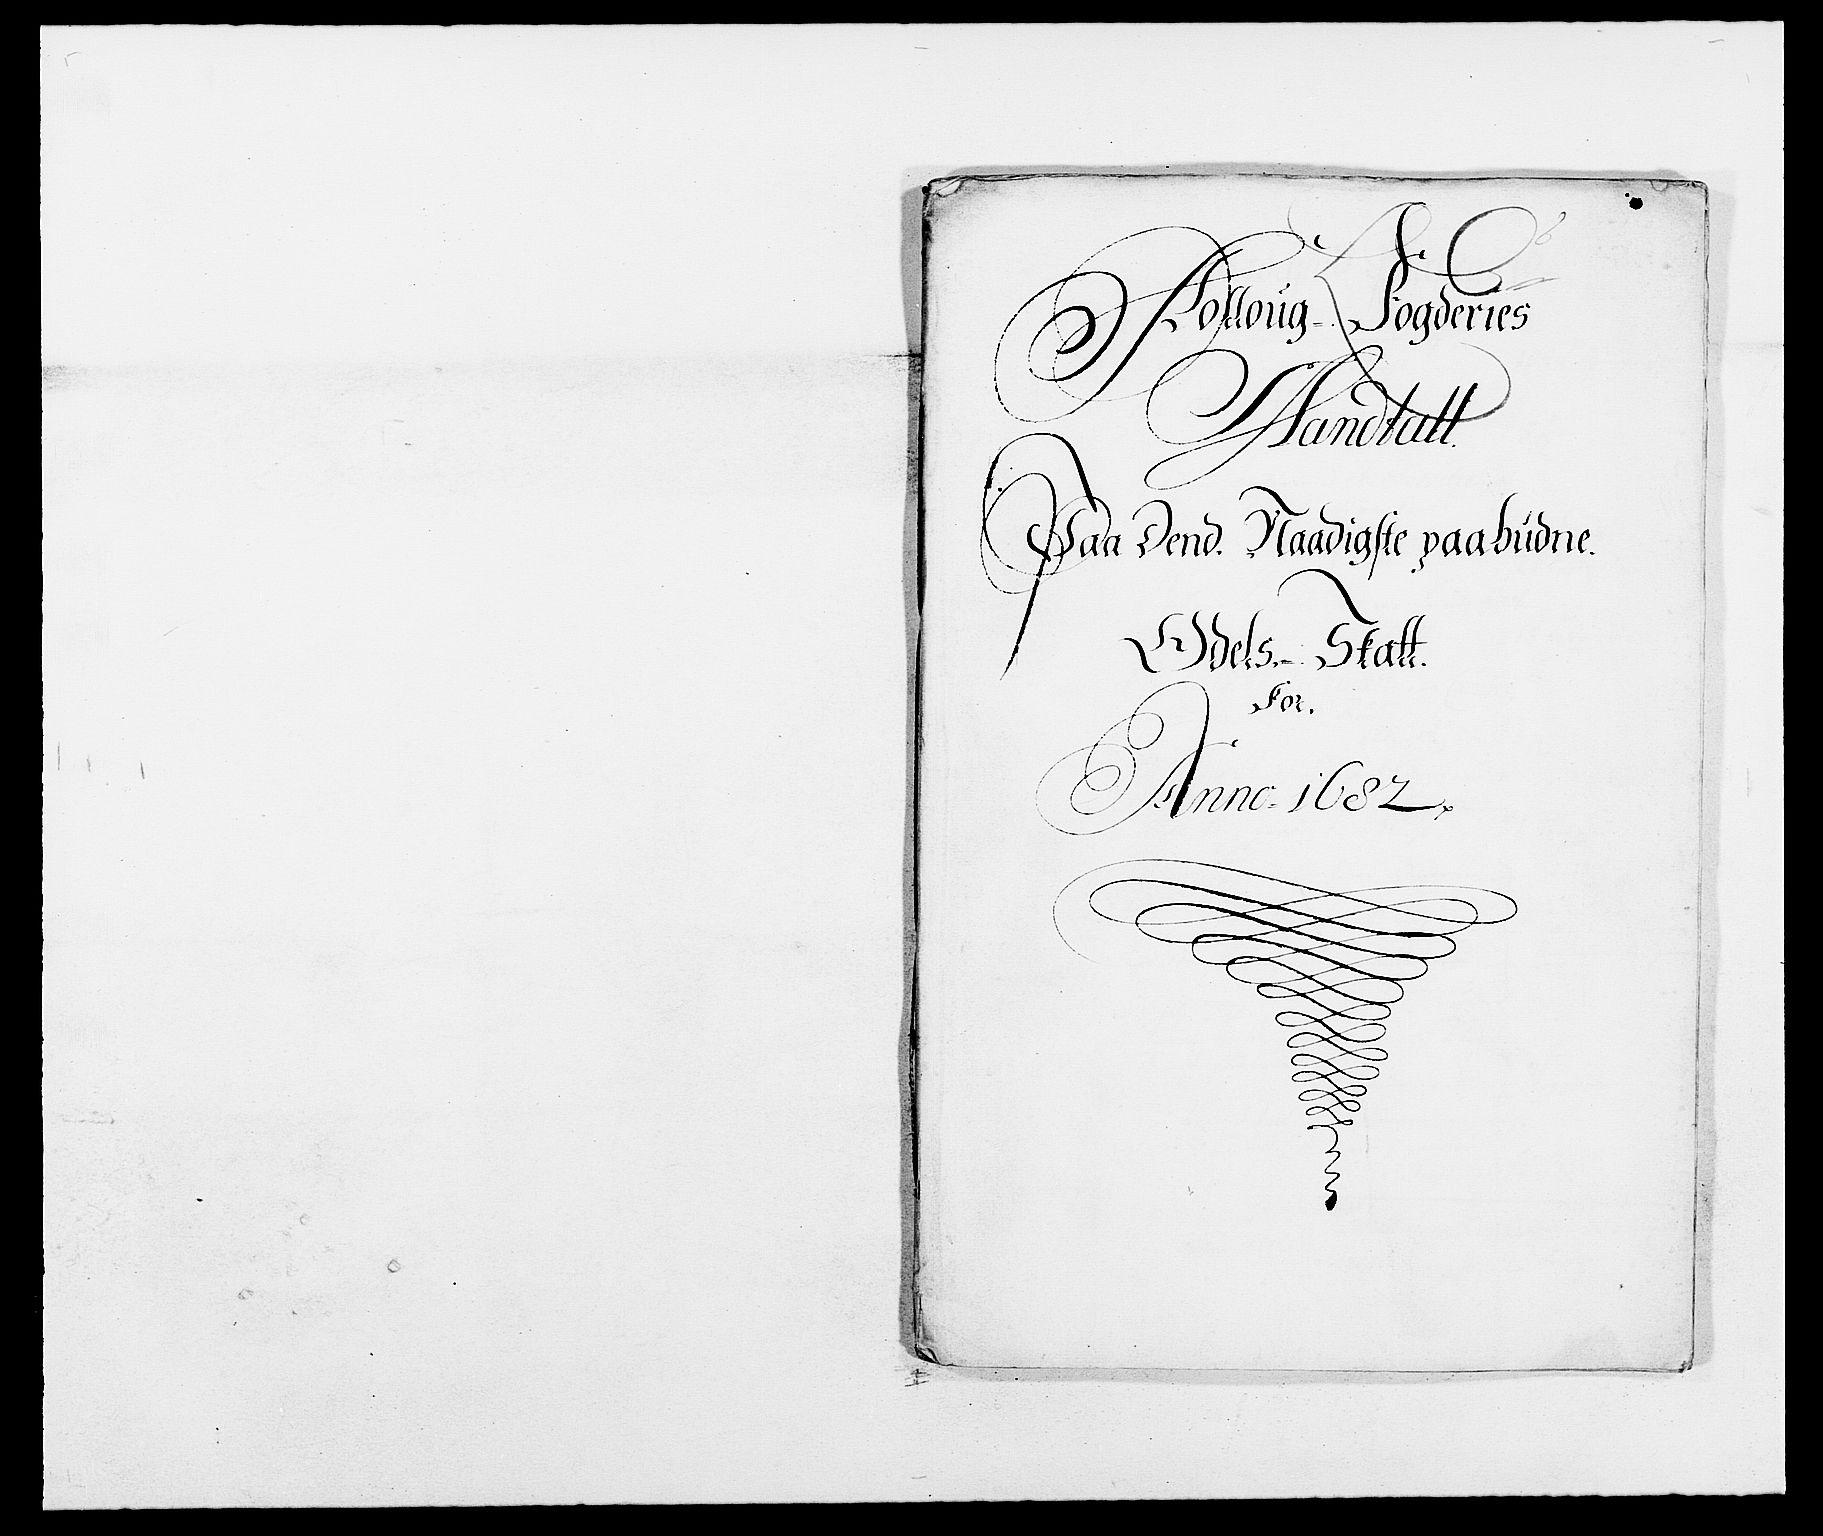 RA, Rentekammeret inntil 1814, Reviderte regnskaper, Fogderegnskap, R09/L0430: Fogderegnskap Follo, 1682-1683, s. 146